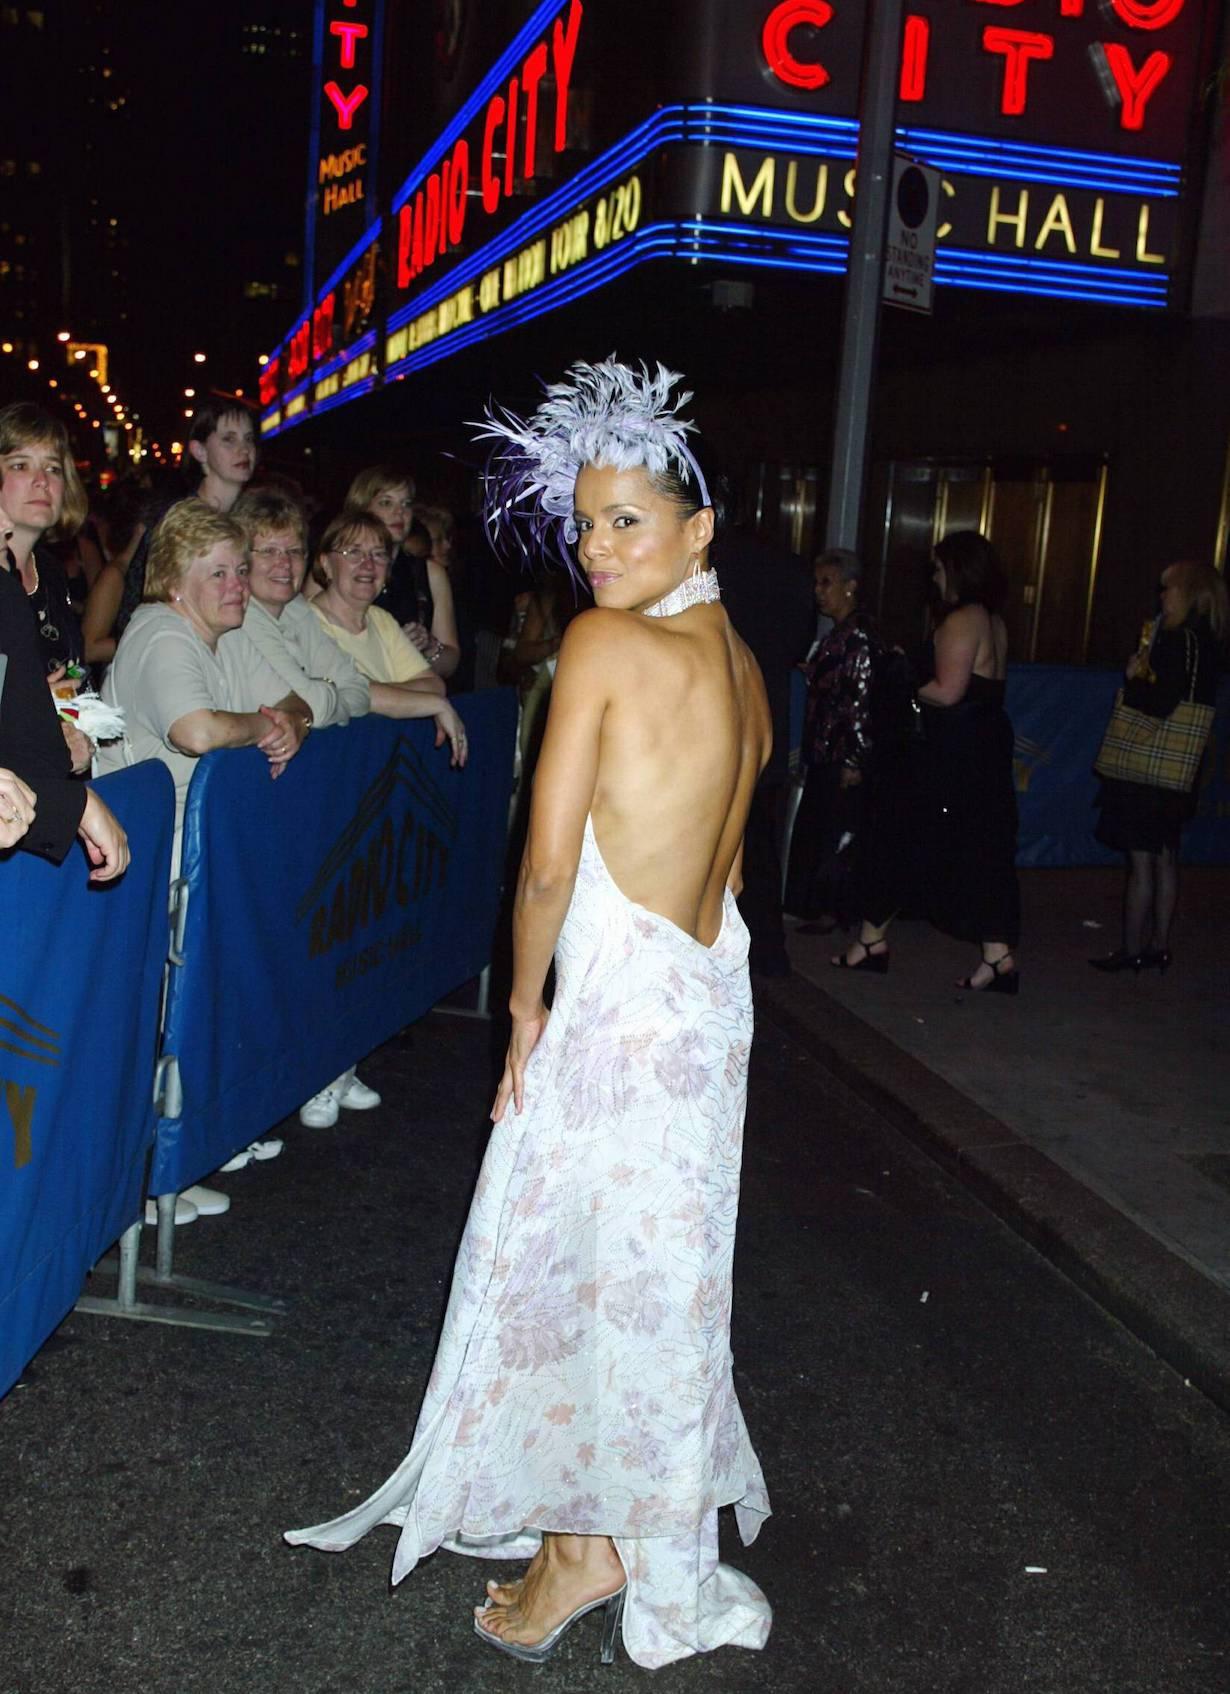 Victoria Rowell 31st Annual Daytime Emmy Awards-Arrival Radio City Music Hall 5/21/04 ©John Paschal/jpistudios.com 310-657-9661